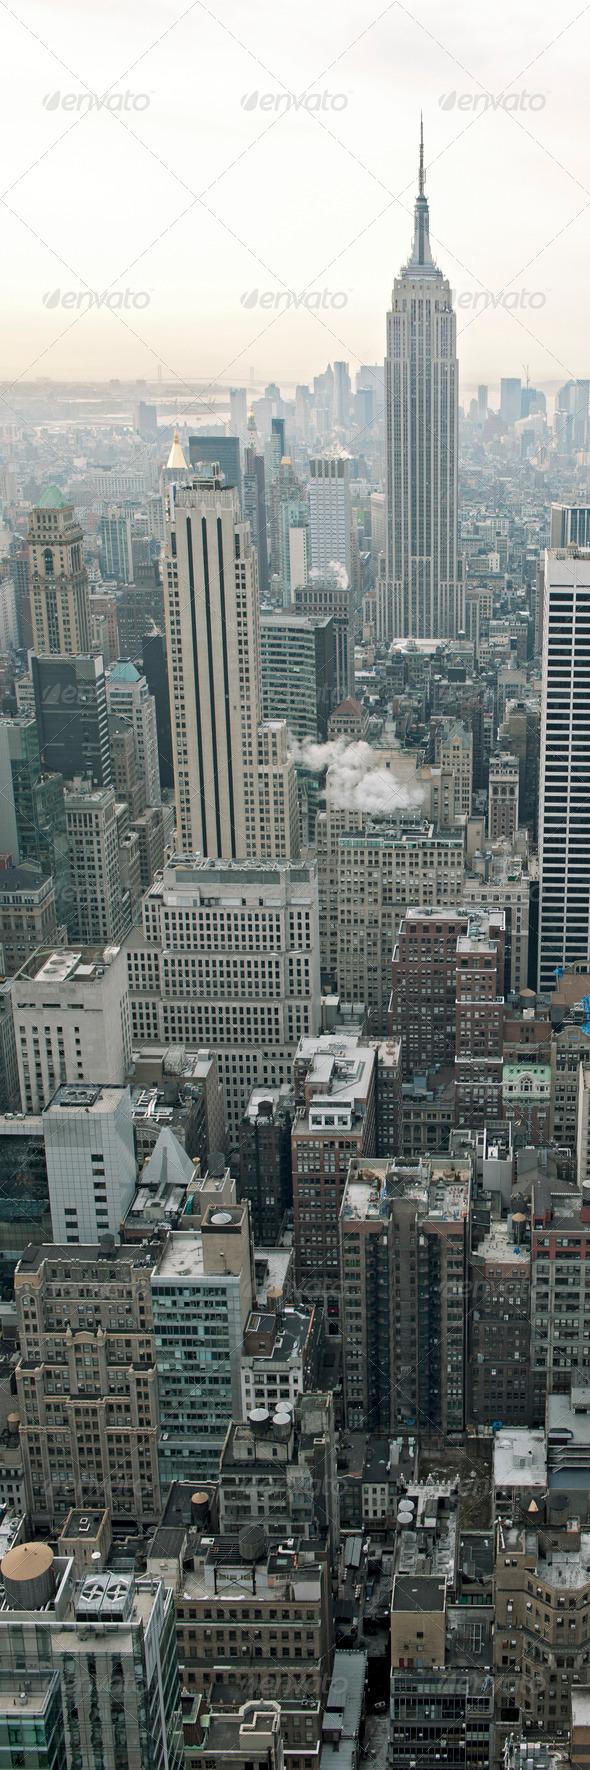 New York City skyline view from Rockefeller Center, New York, USA - Stock Photo - Images